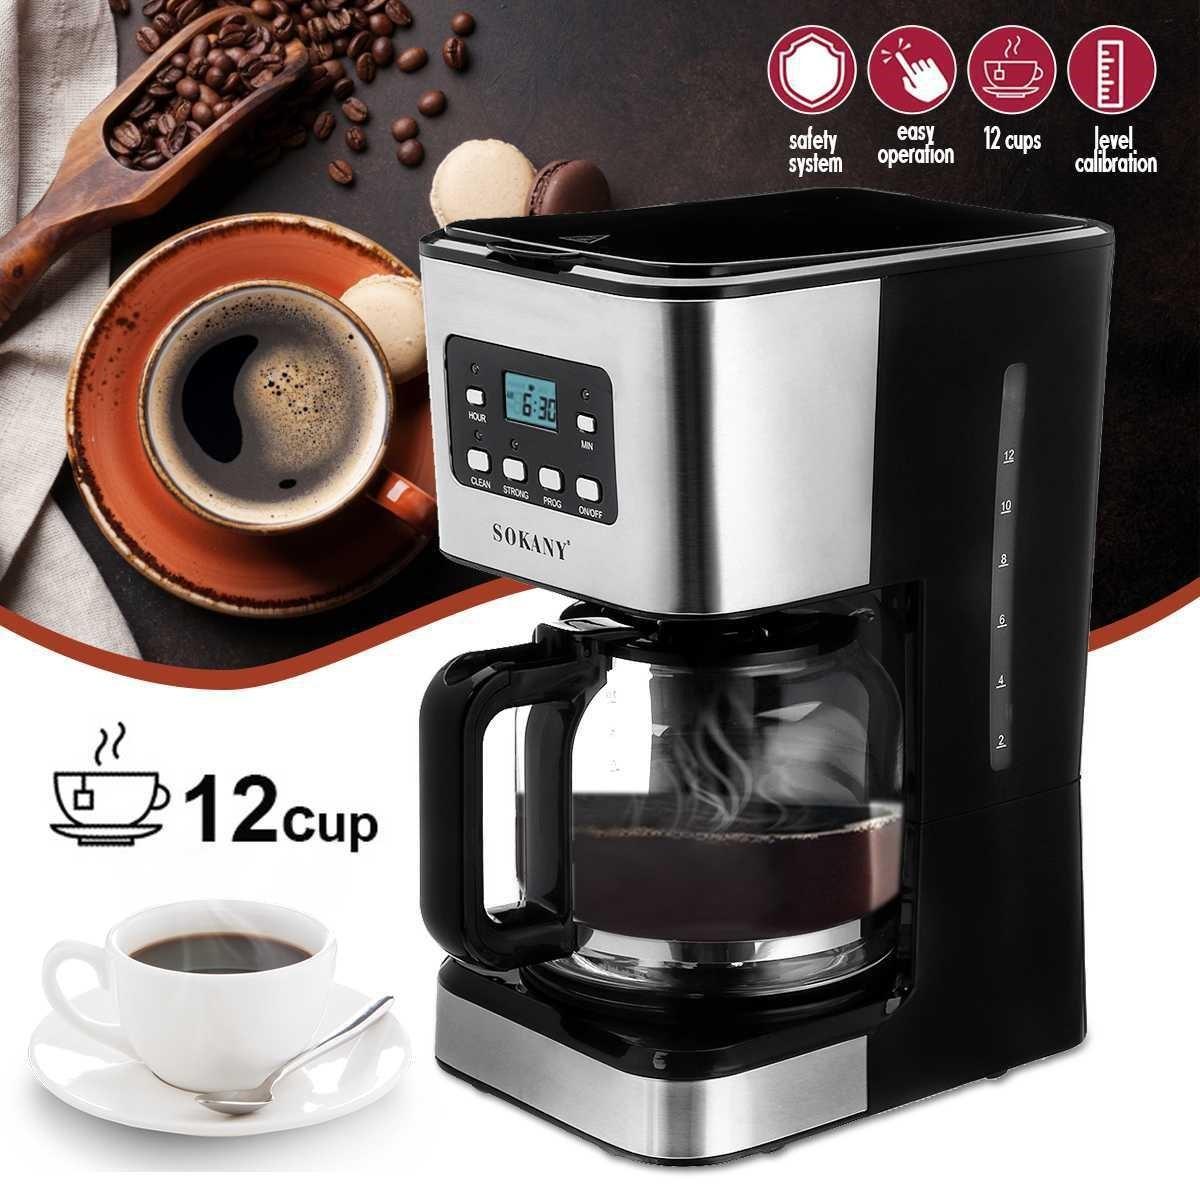 Electric Coffee Machines 12 Cups 1.5L Detachable Electric Foam Coffee Maker